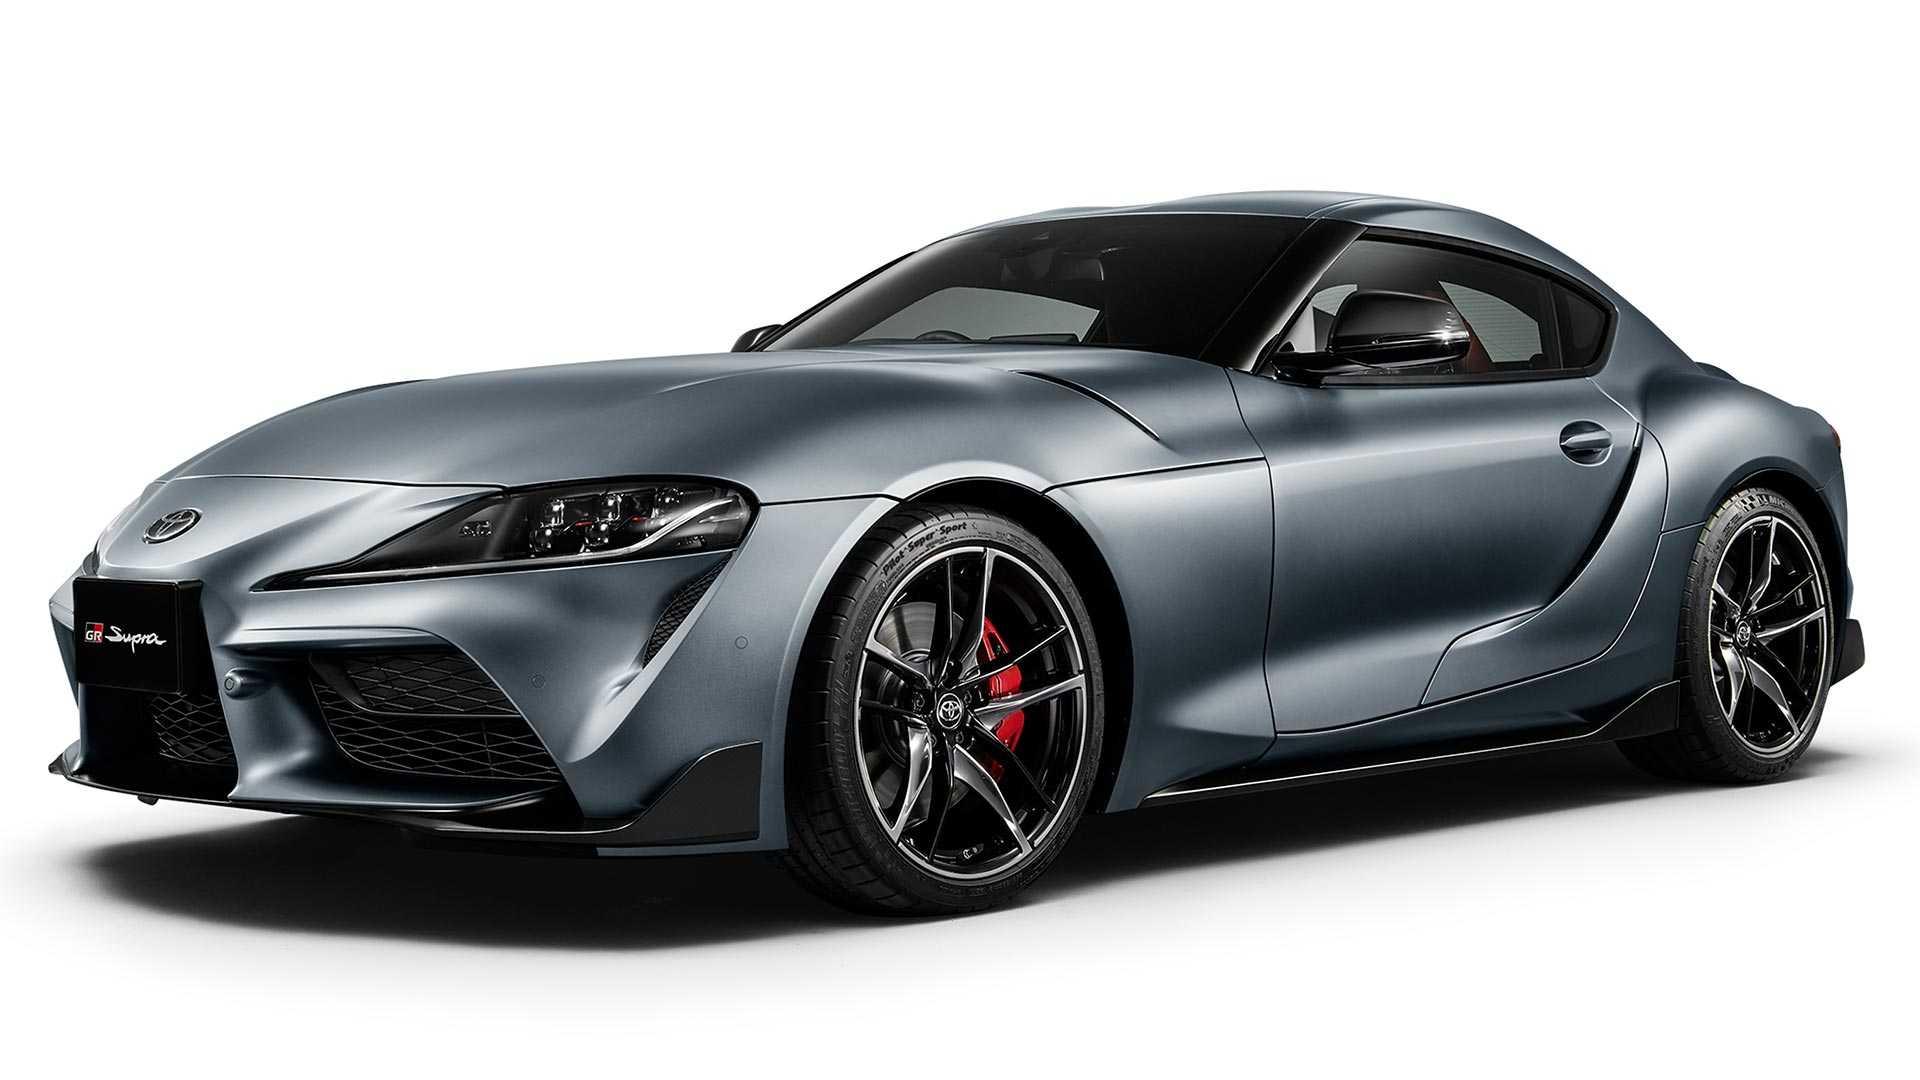 1_Toyota-Supra-Matte-Storm-Gray-1